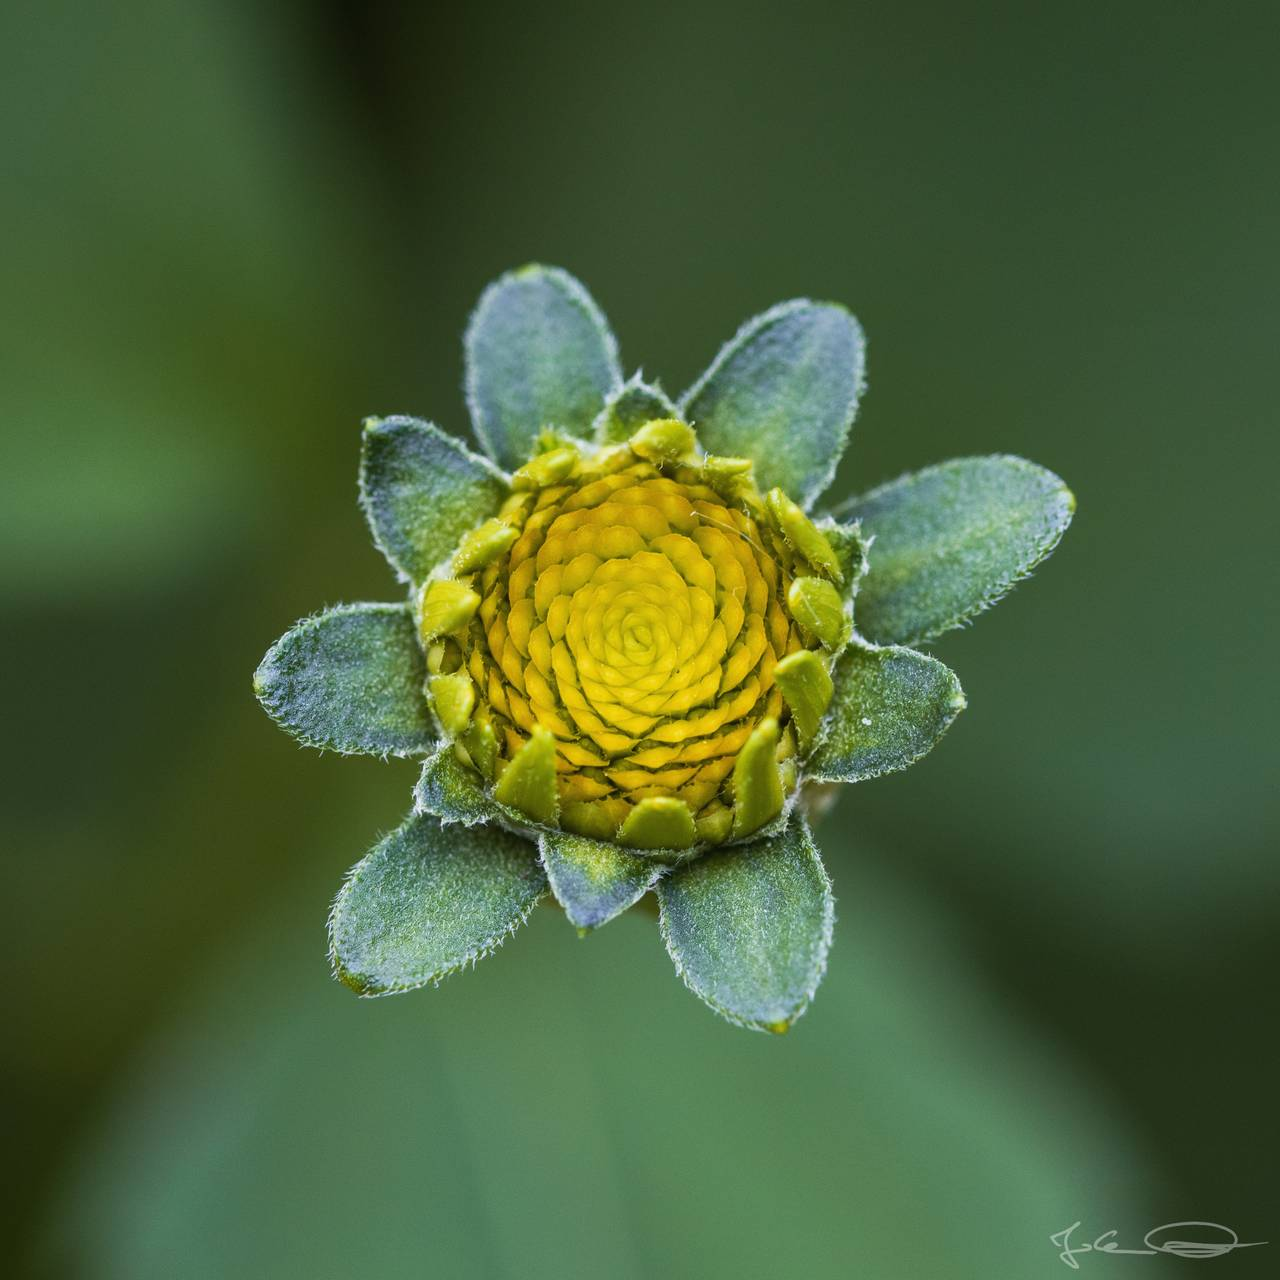 Hive AlphabetHunt Yellow Flower